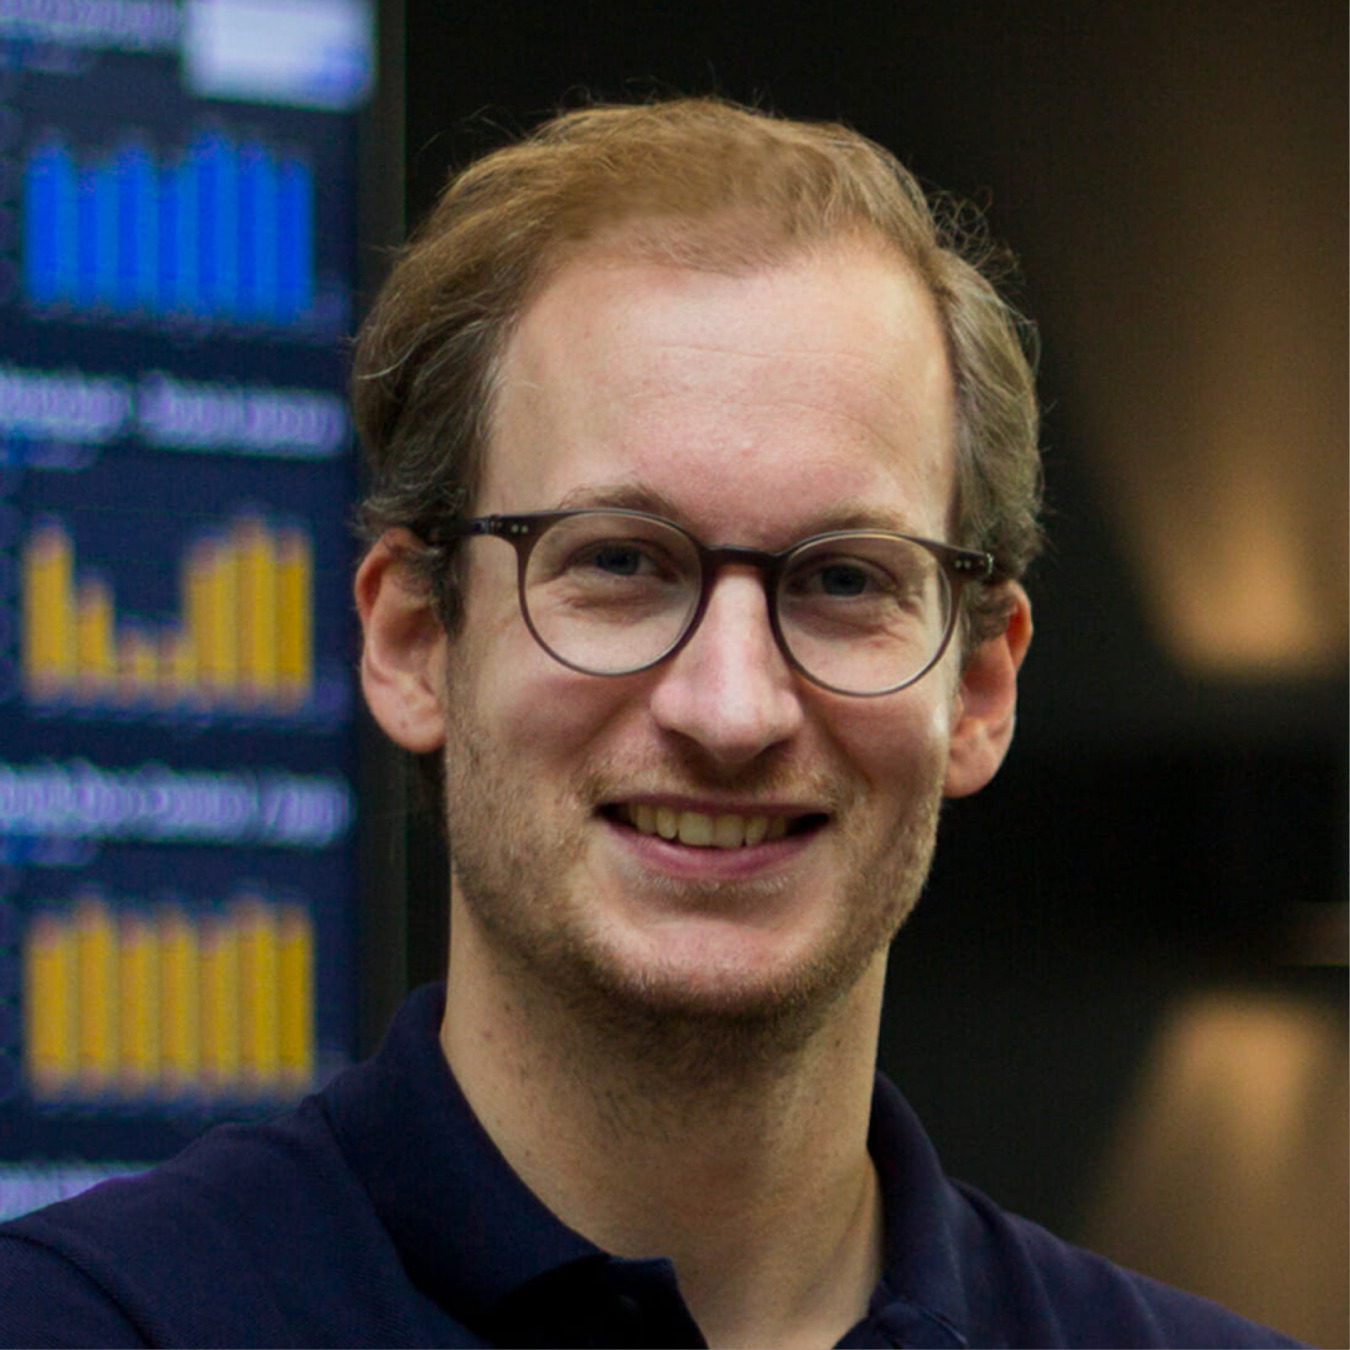 Geoffrey Molenschot, NextUp